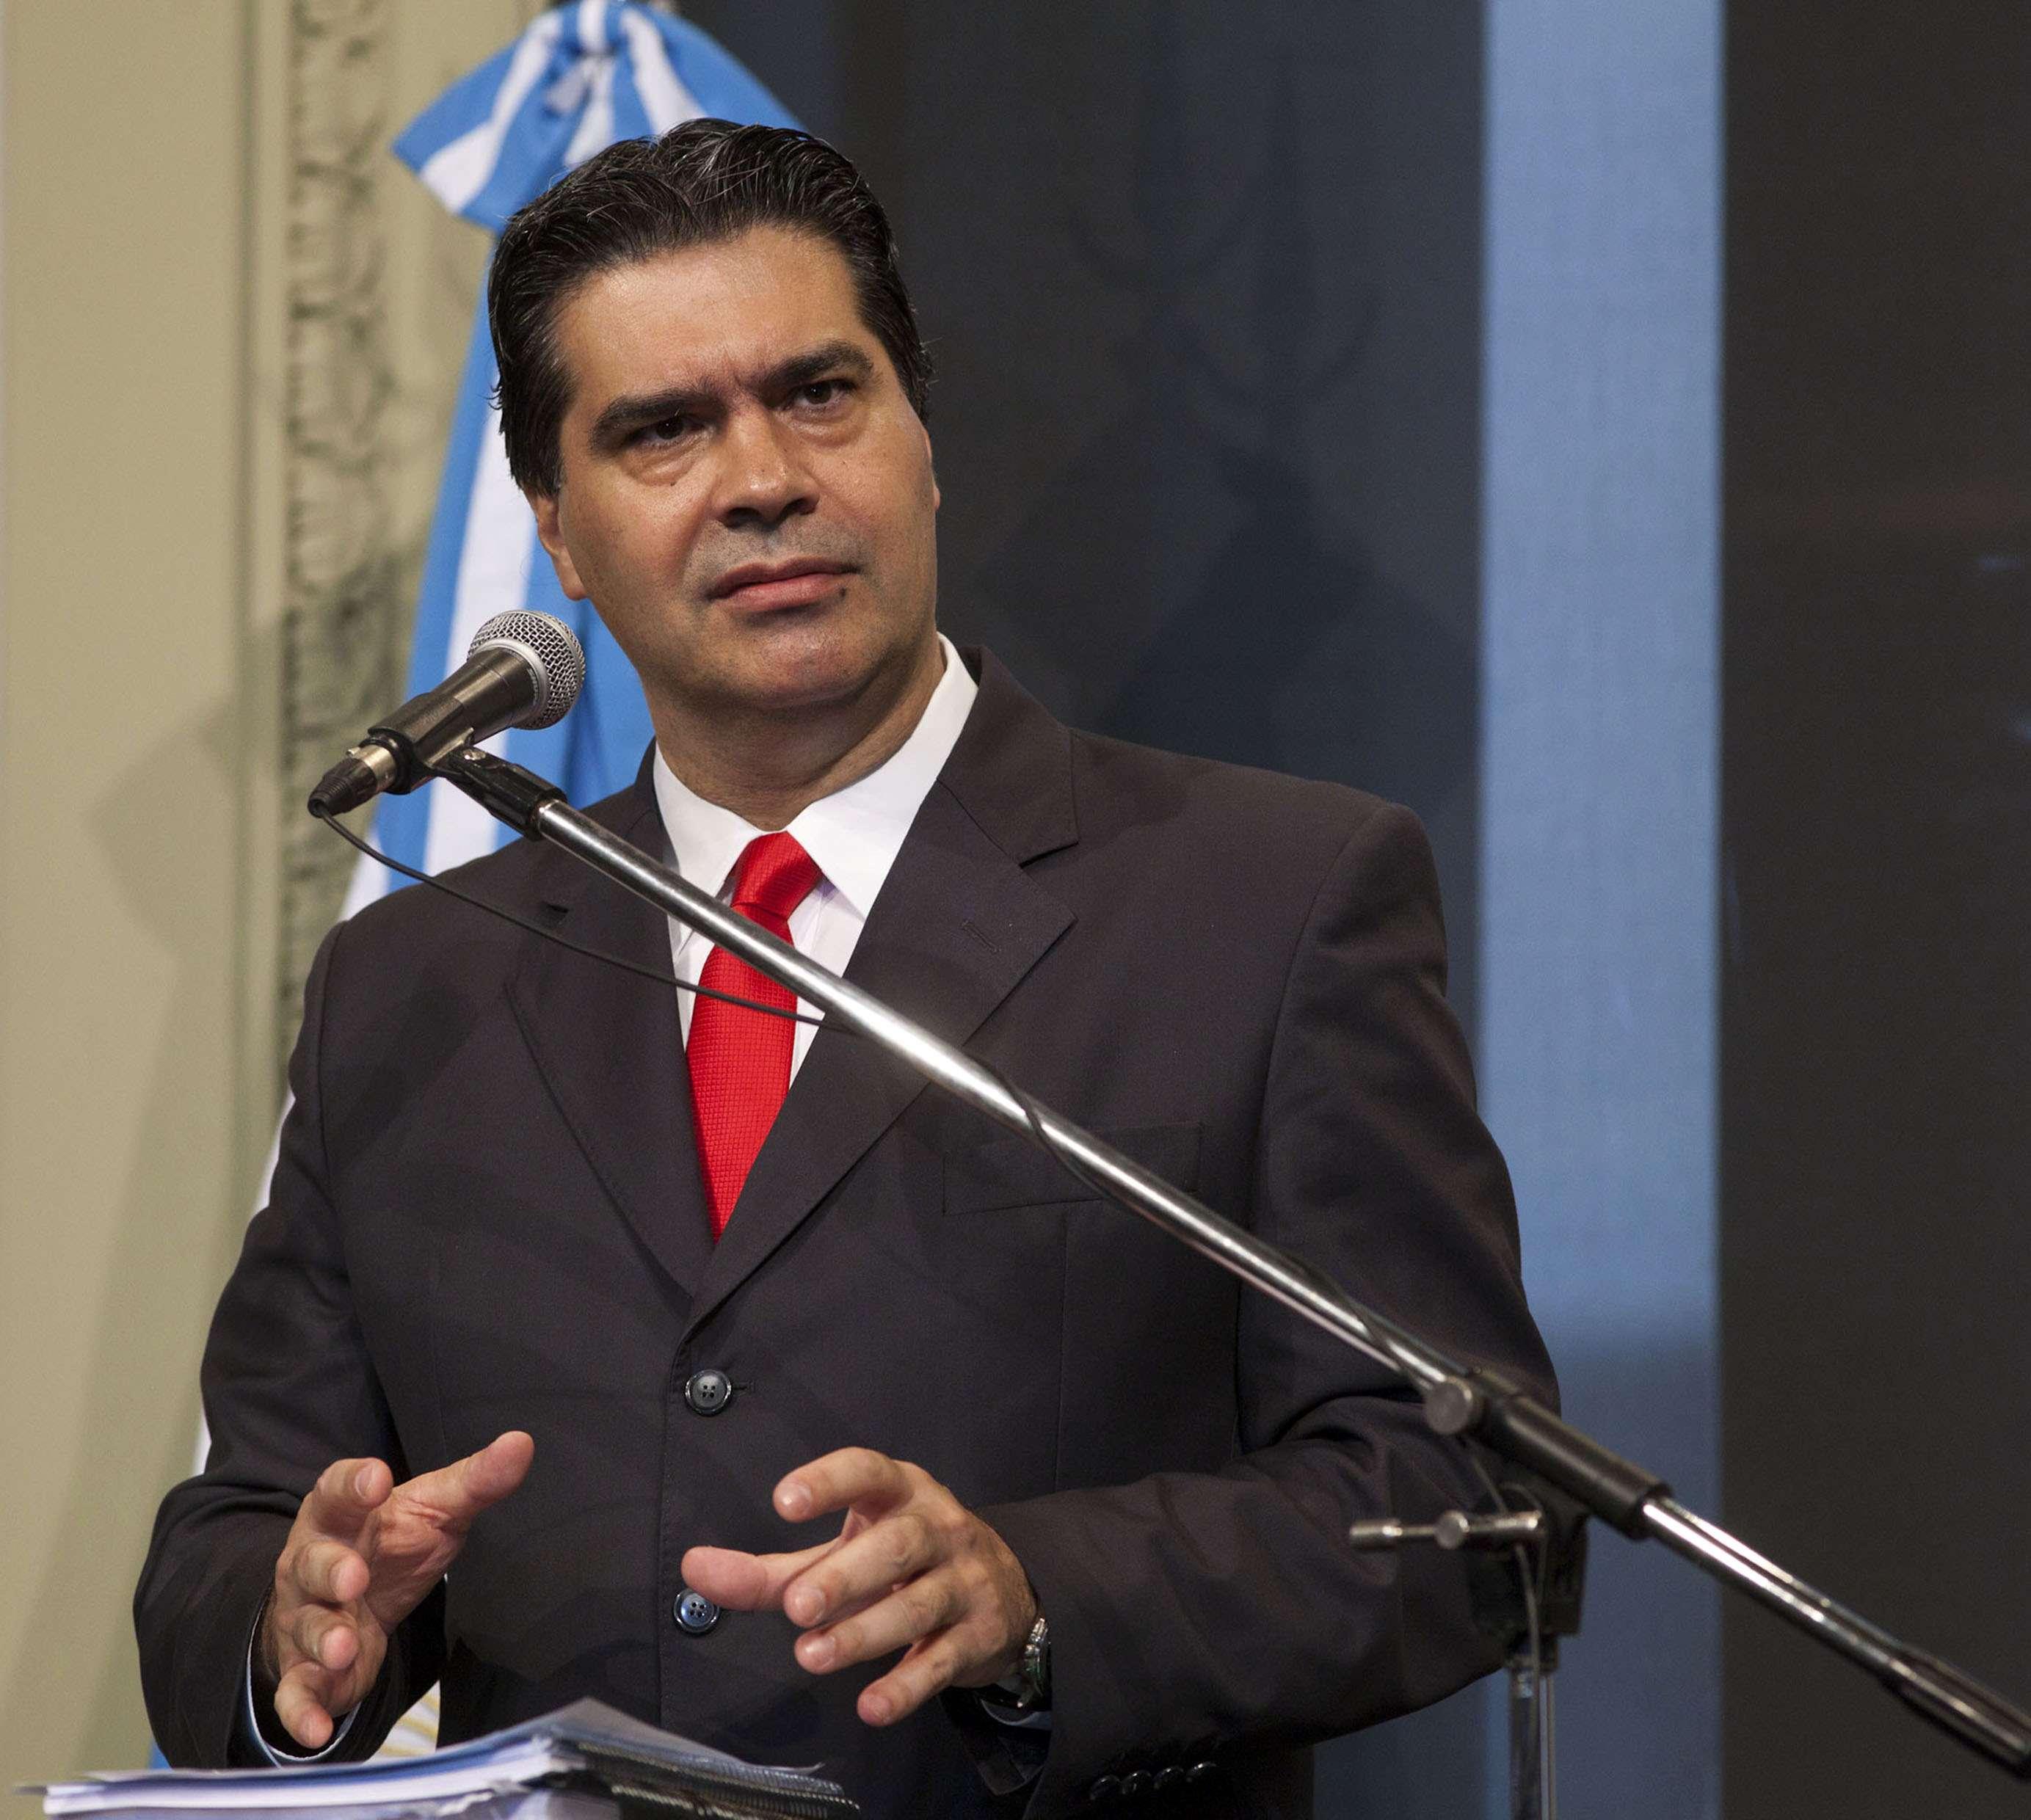 El Jefe de Gabinete, Jorge Capitanich. Foto: NA